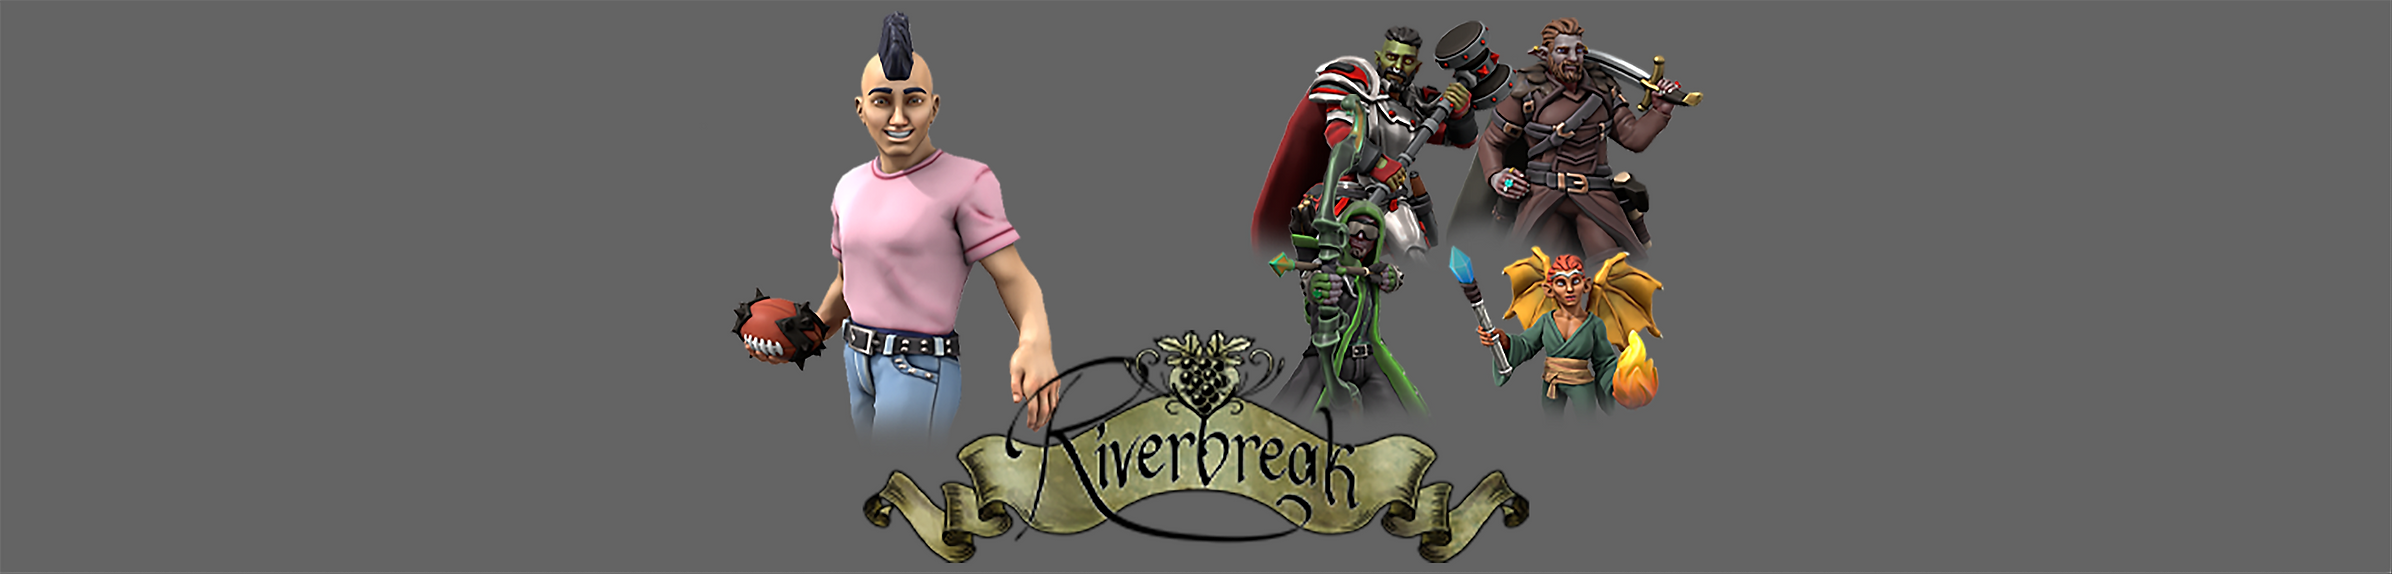 Riverbreak Banner.png